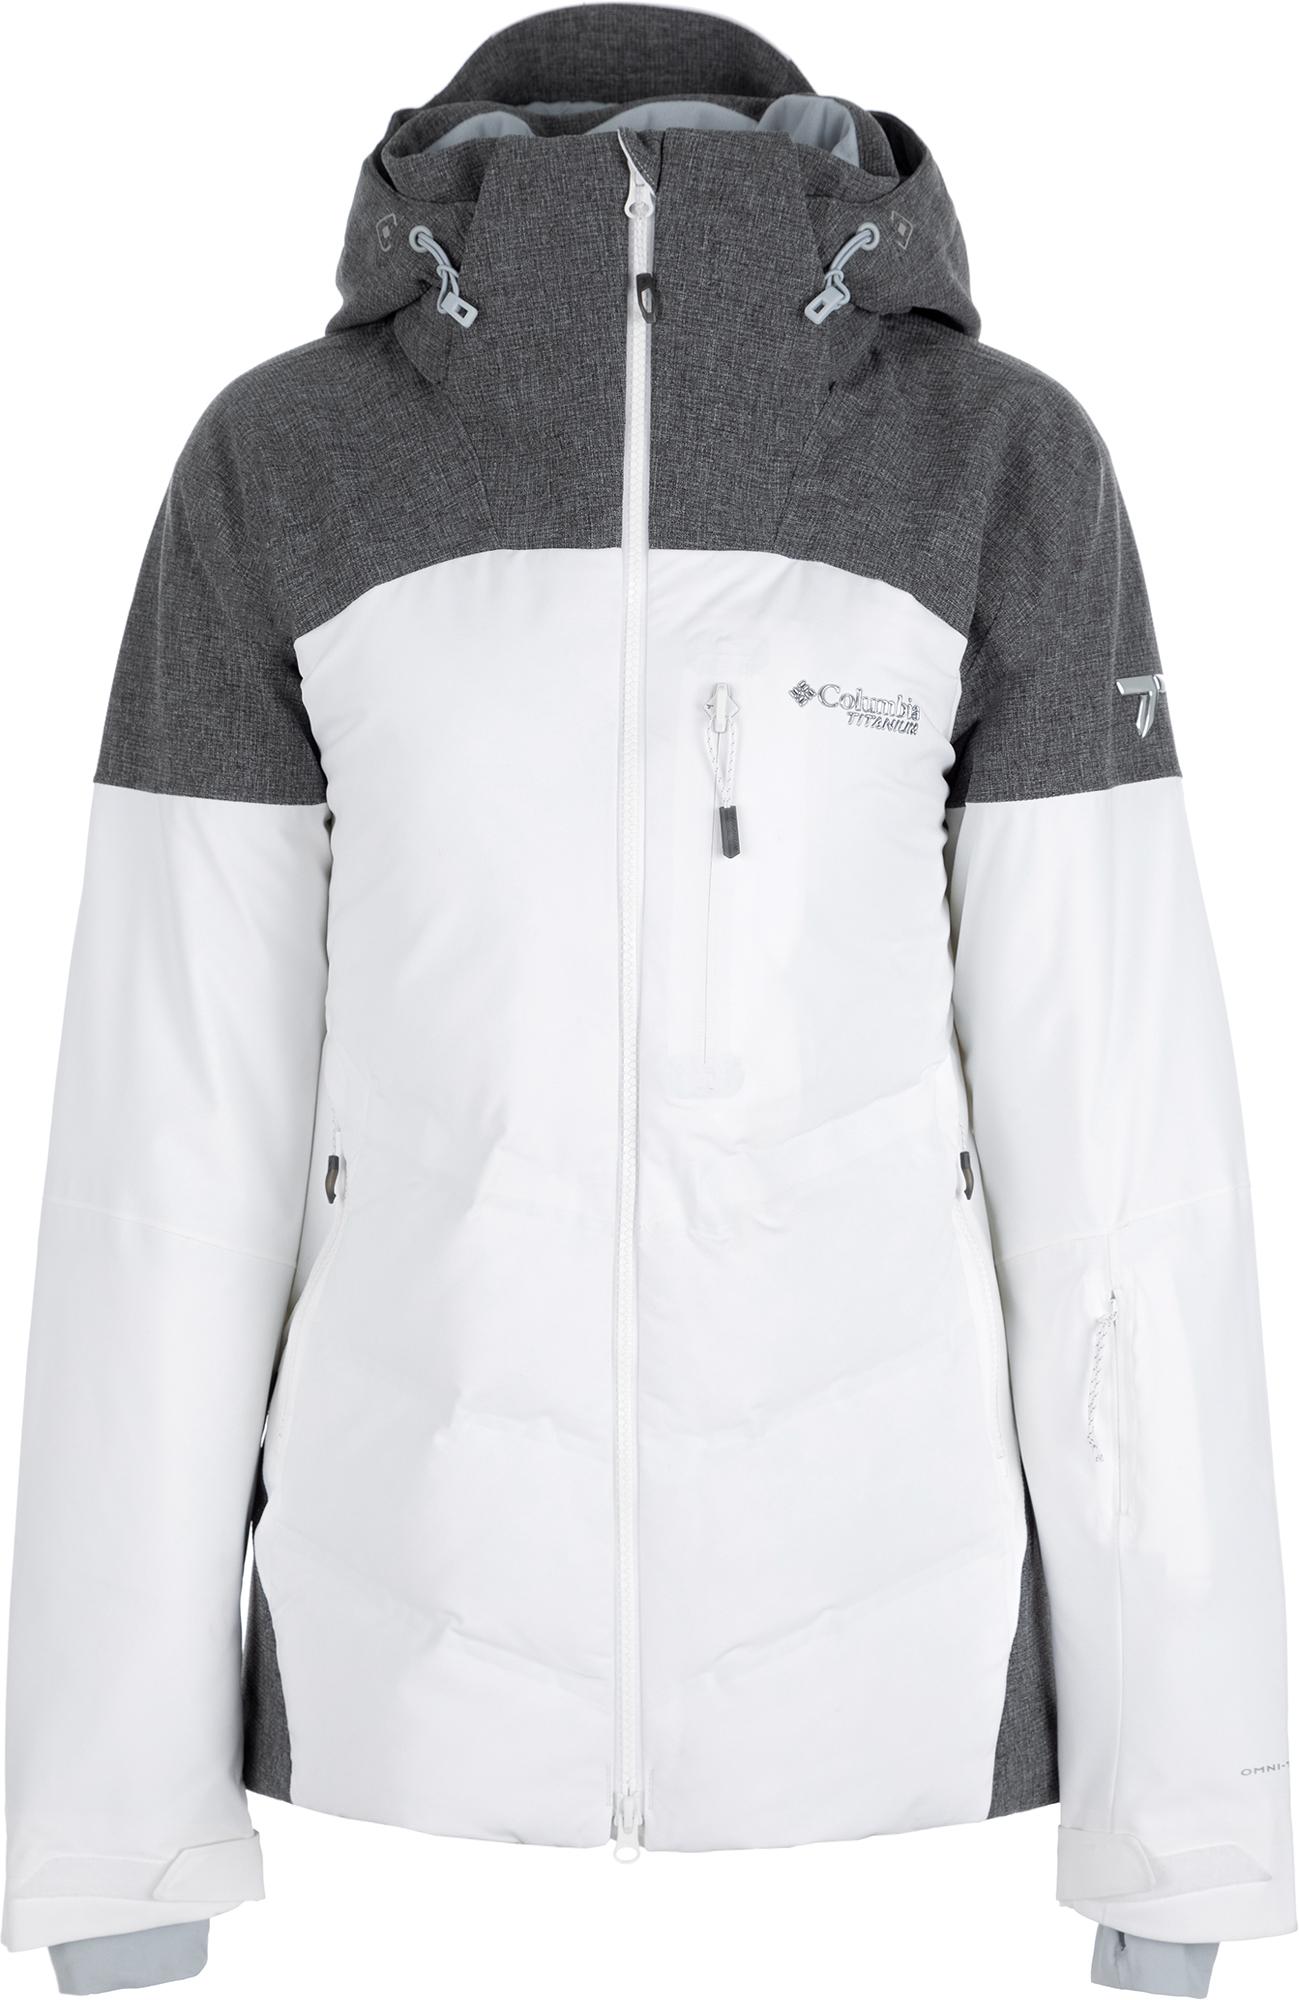 цена на Columbia Куртка пуховая женская Columbia Powder Keg II, размер 44